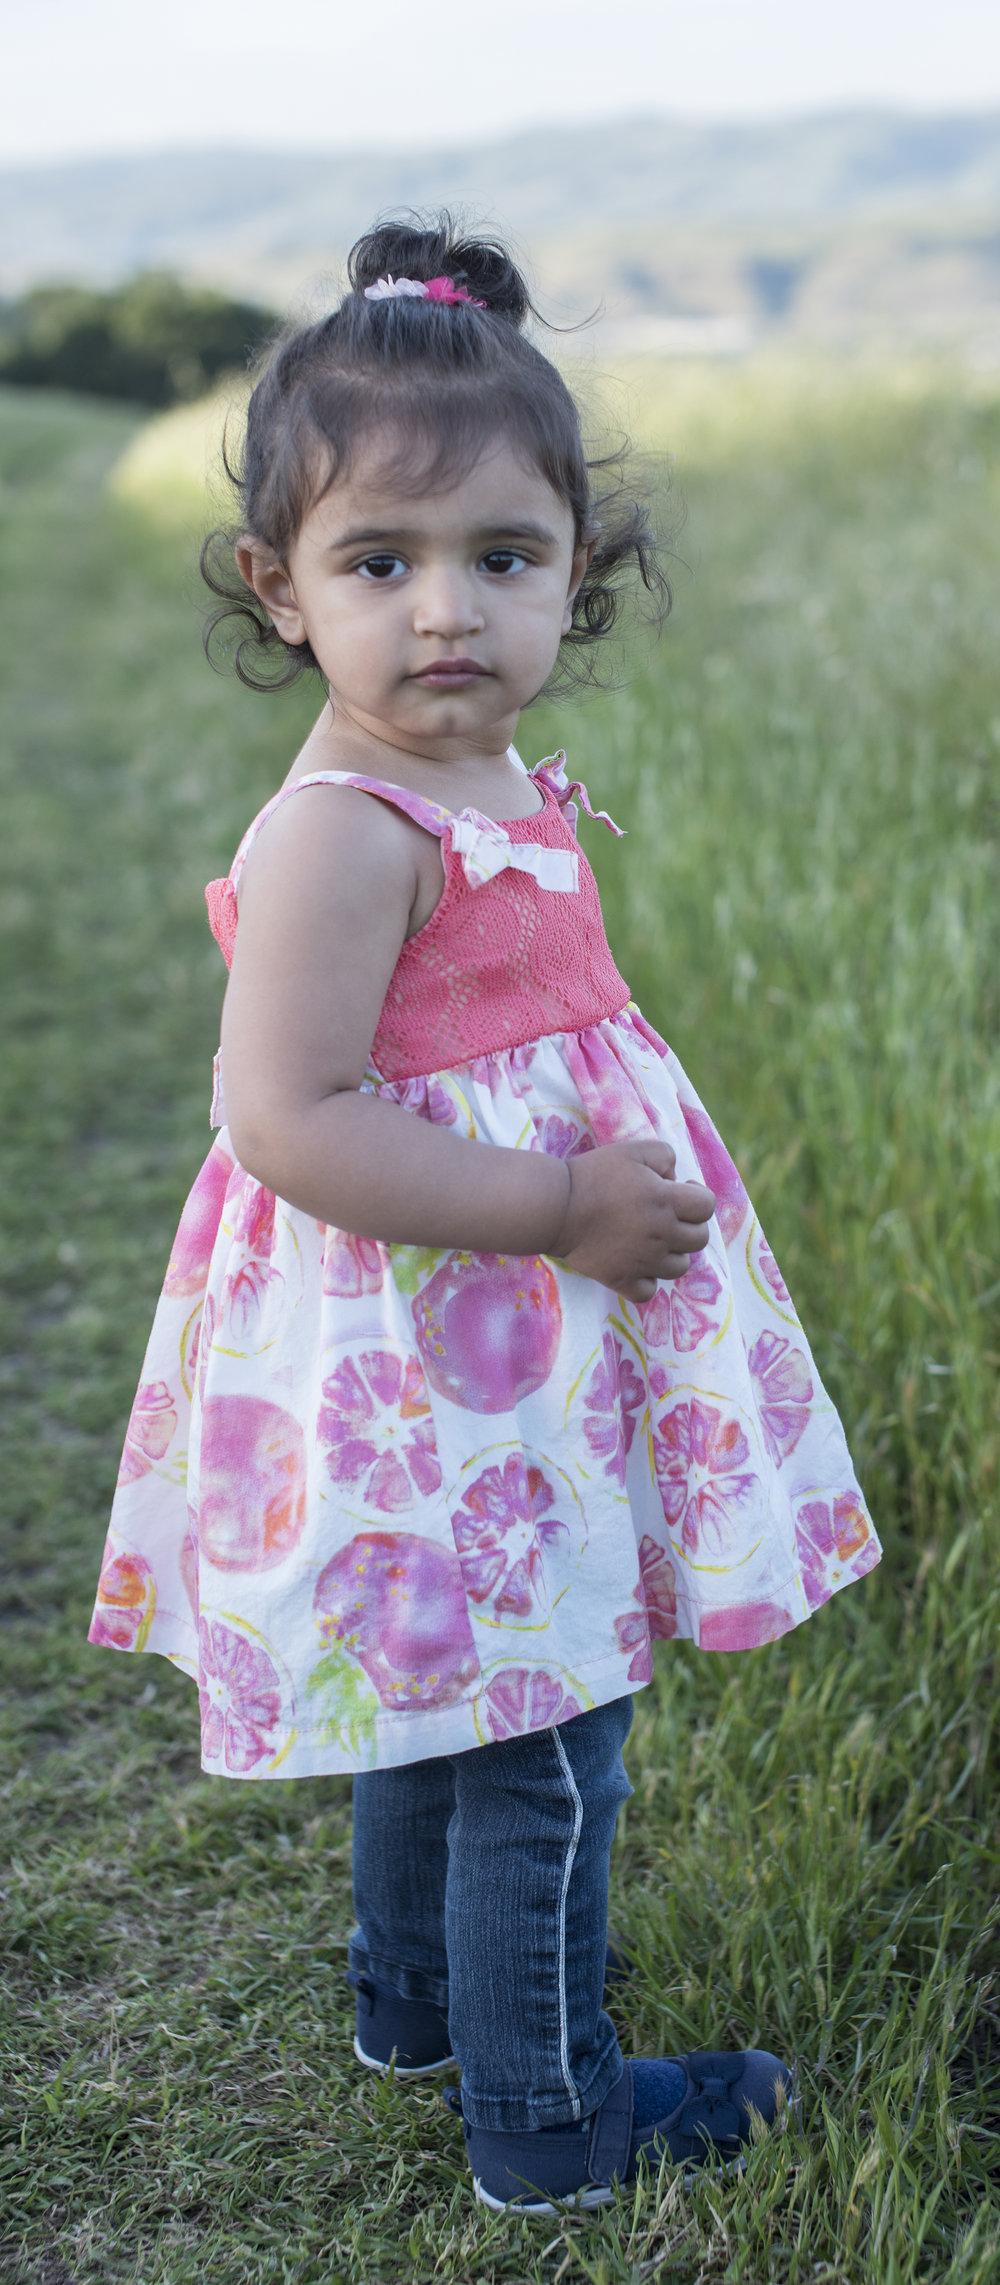 A Toddler Enjoying Nature at Santa Teresa County Park, San Jose, California